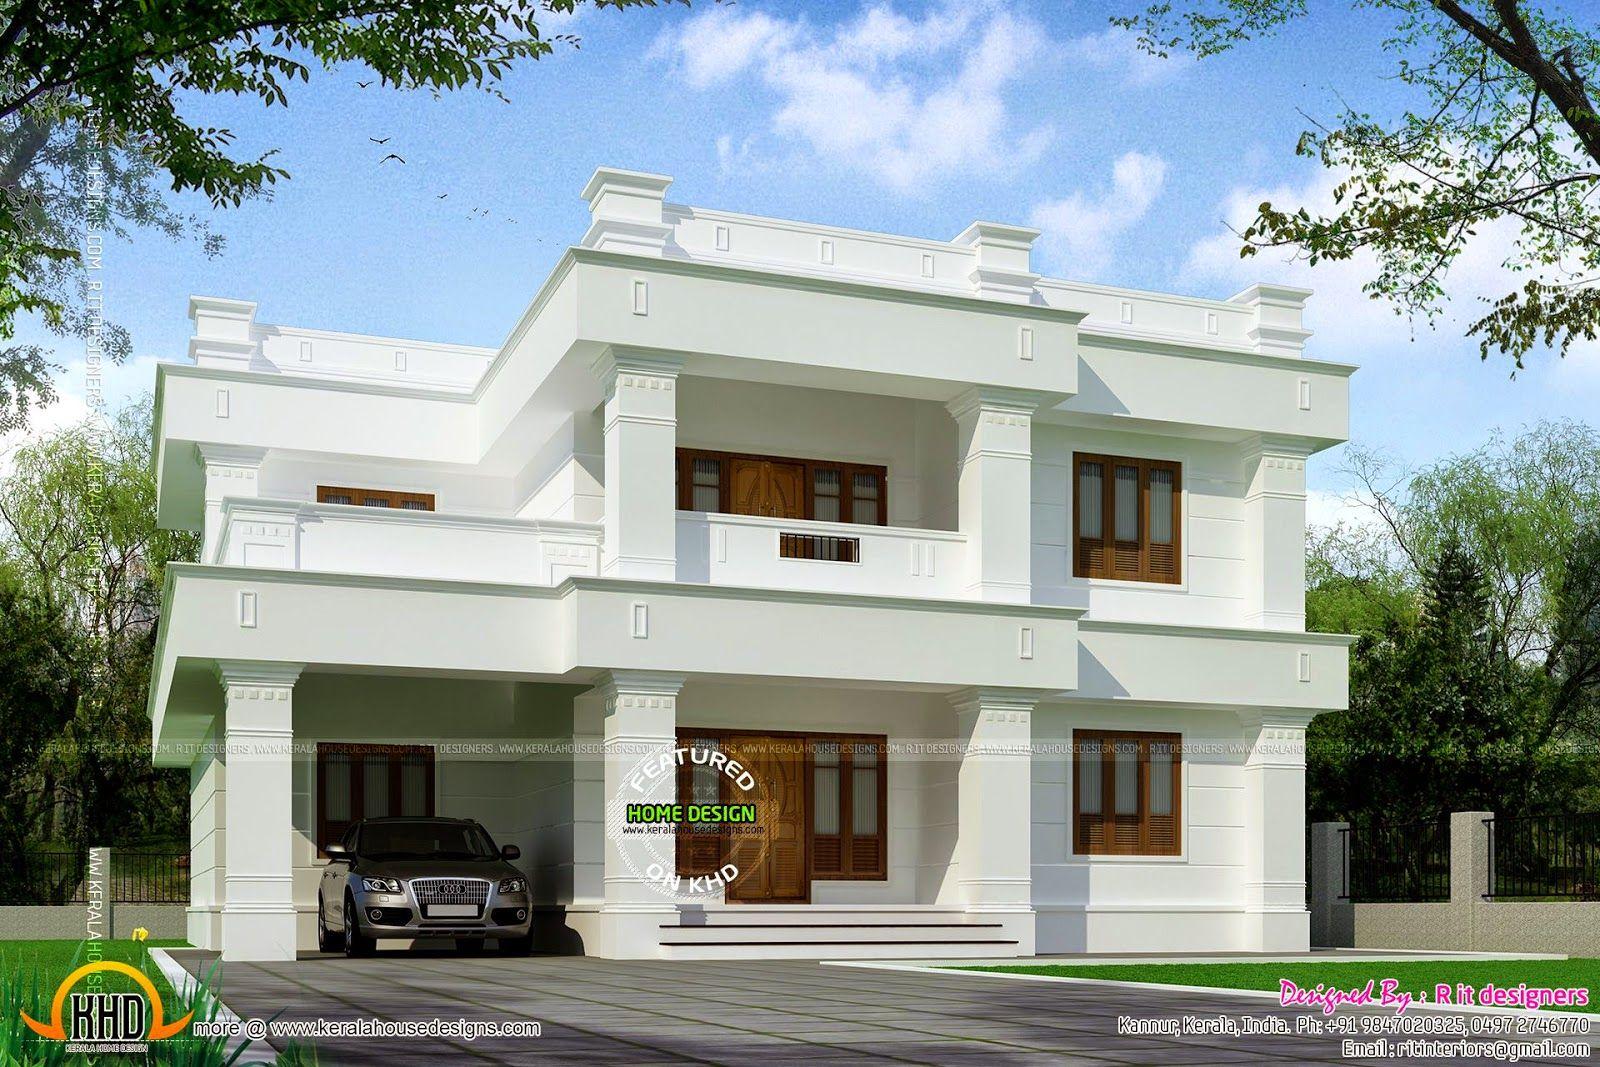 Simple Flat Roof House Designs Coastal House Plans Rooftop Design Flat Roof House Designs